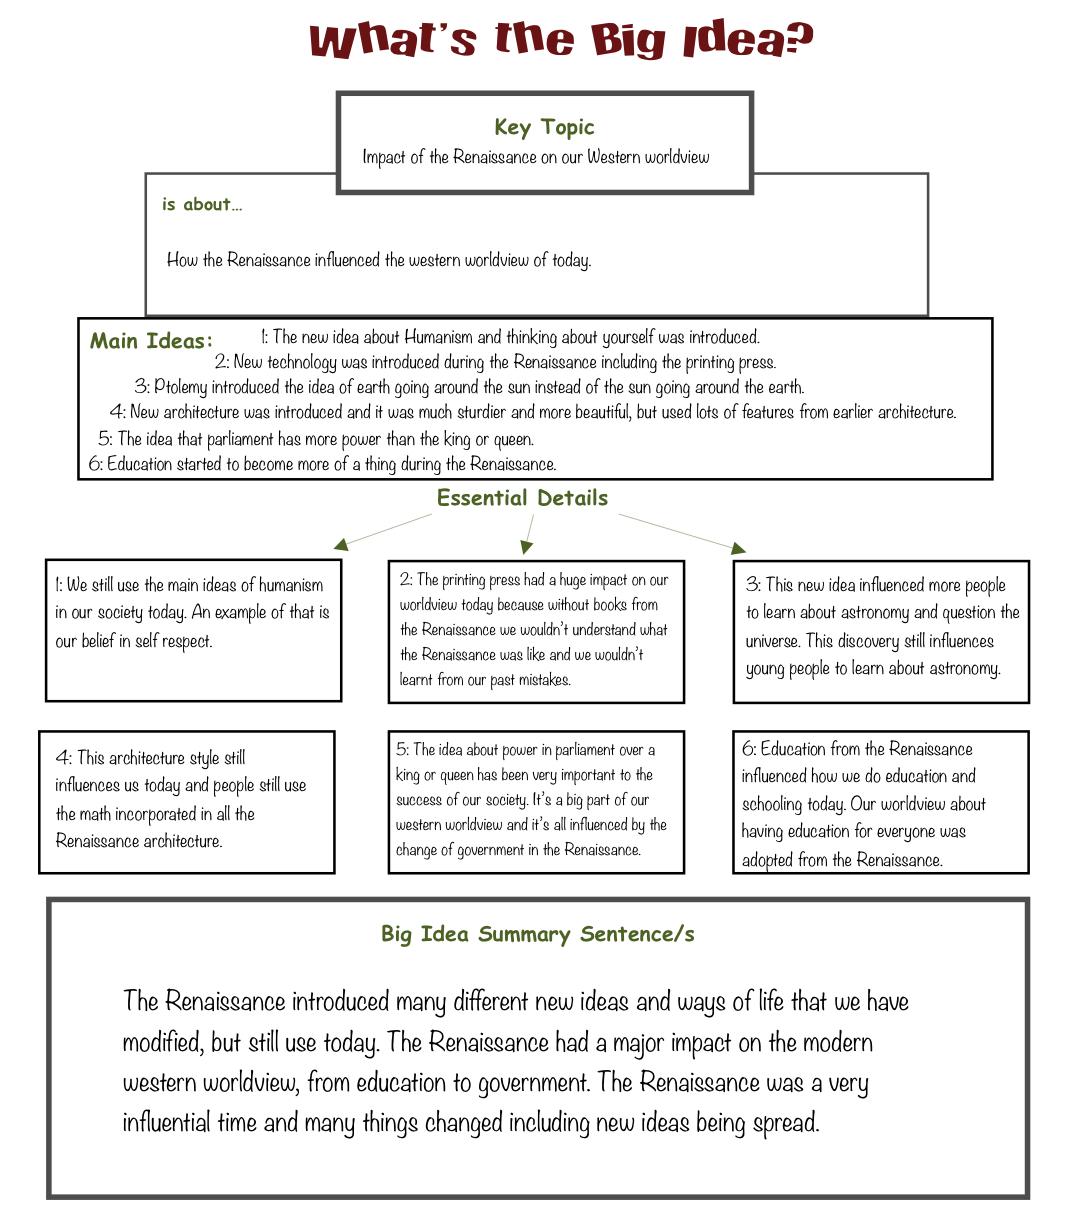 A rerun of the Renaissance – Wuzzup my edubloggers